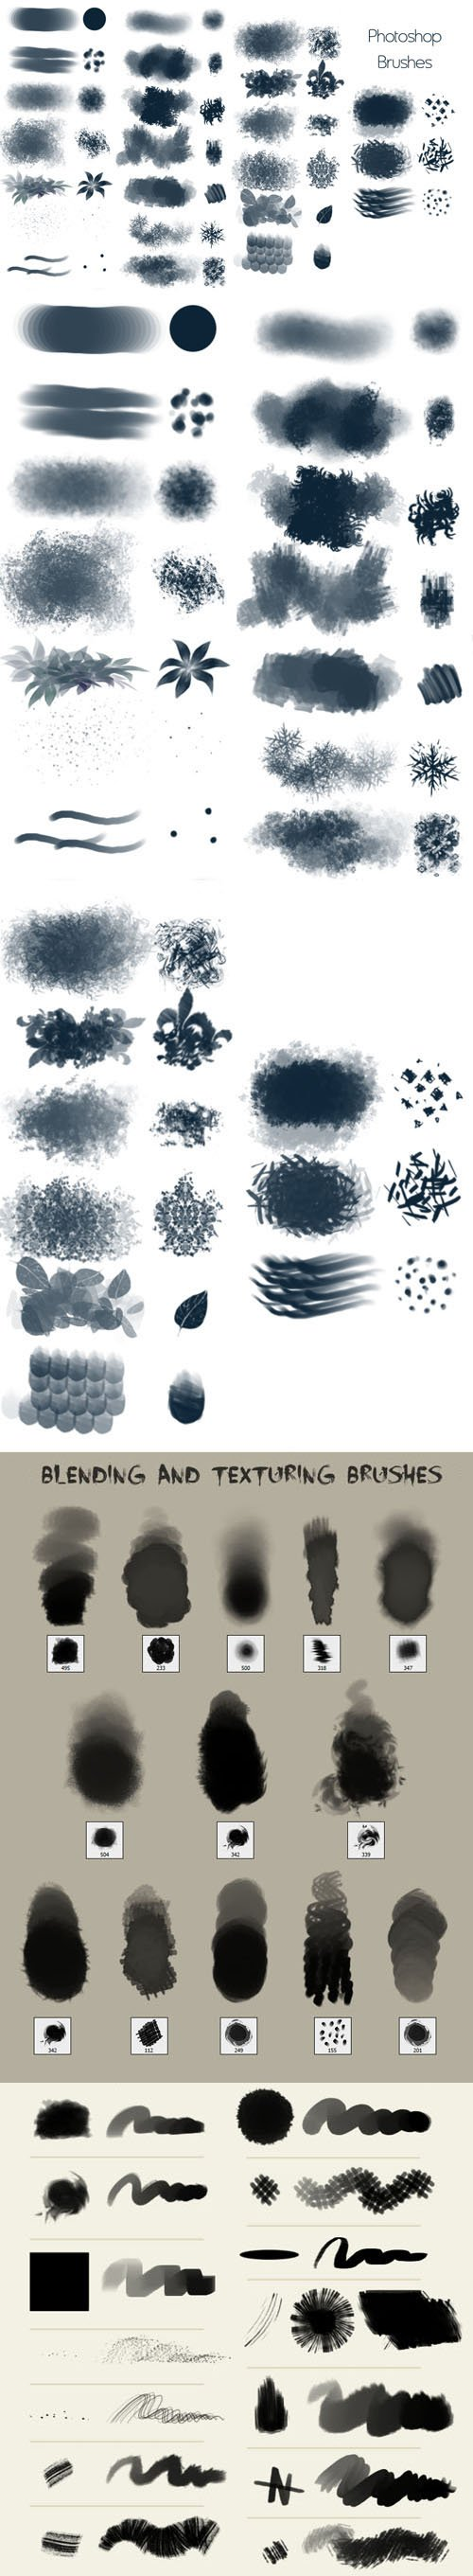 Blending & Texturing - 50 Photoshop Brushes Pack